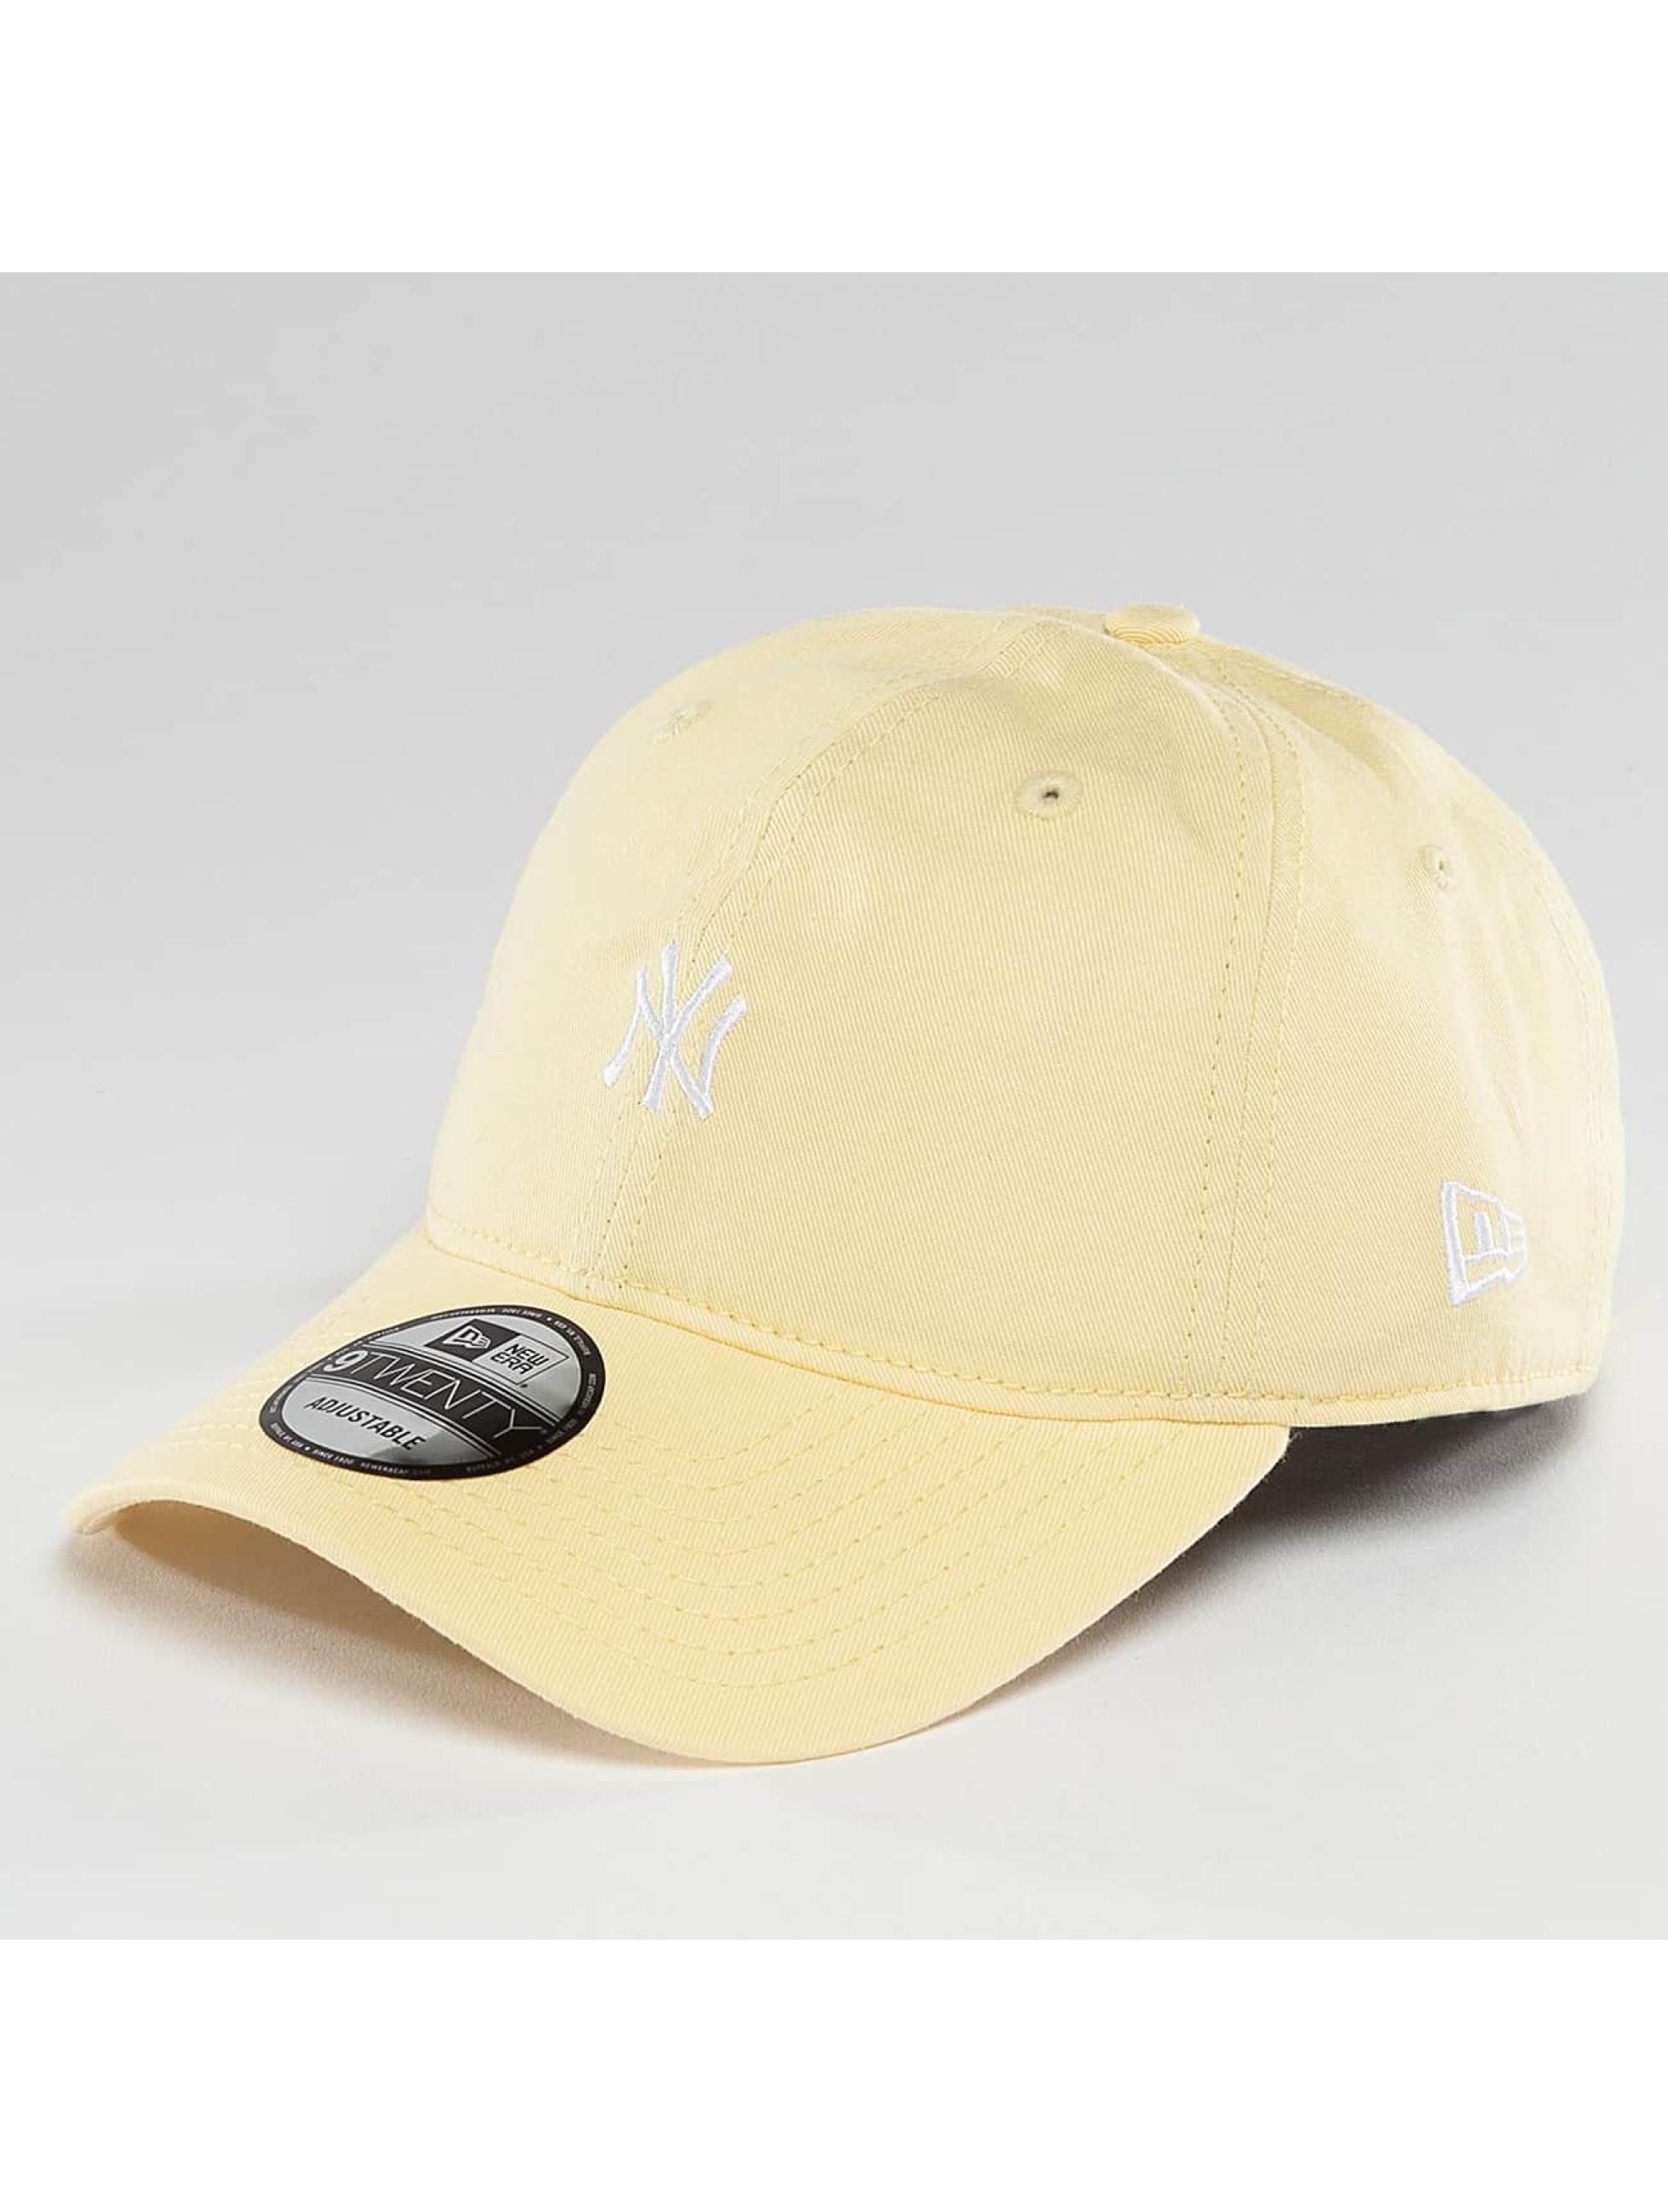 New Era Casquette Snapback & Strapback Pastel Micro NY Yankees 9Twenty jaune